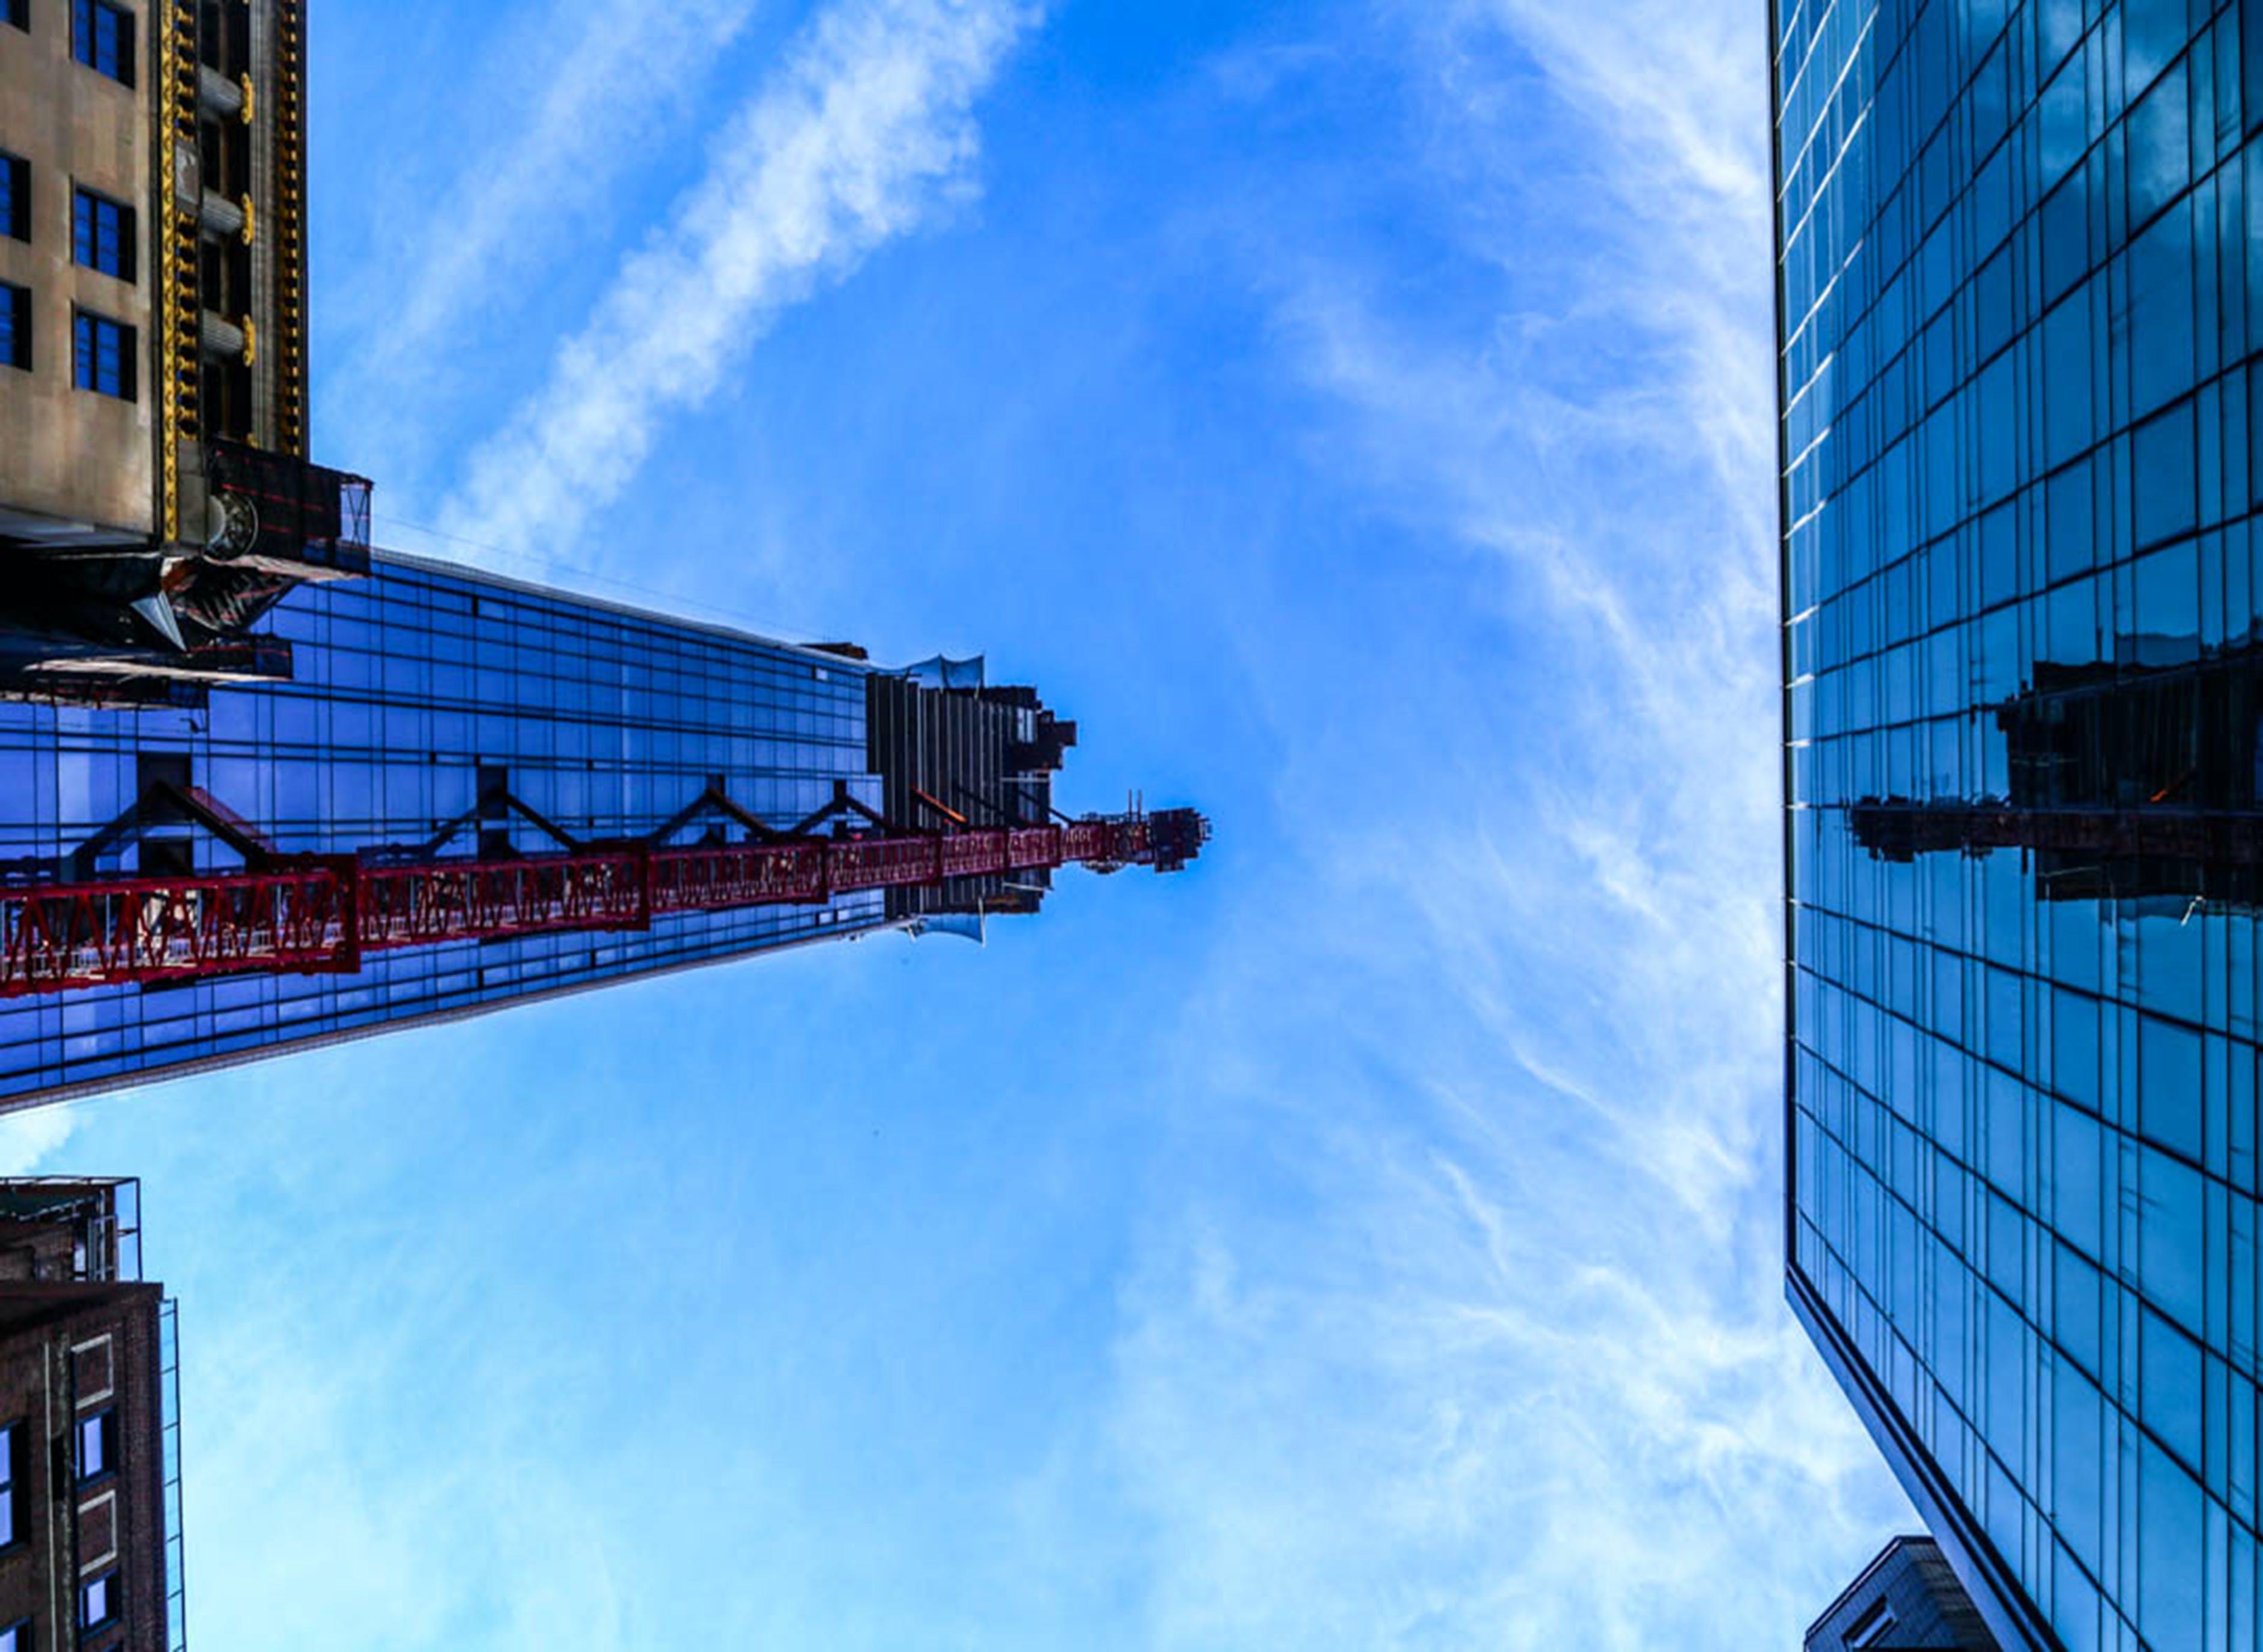 Free stock photo of #Cityscape, #construction, #high rise, #manhattan